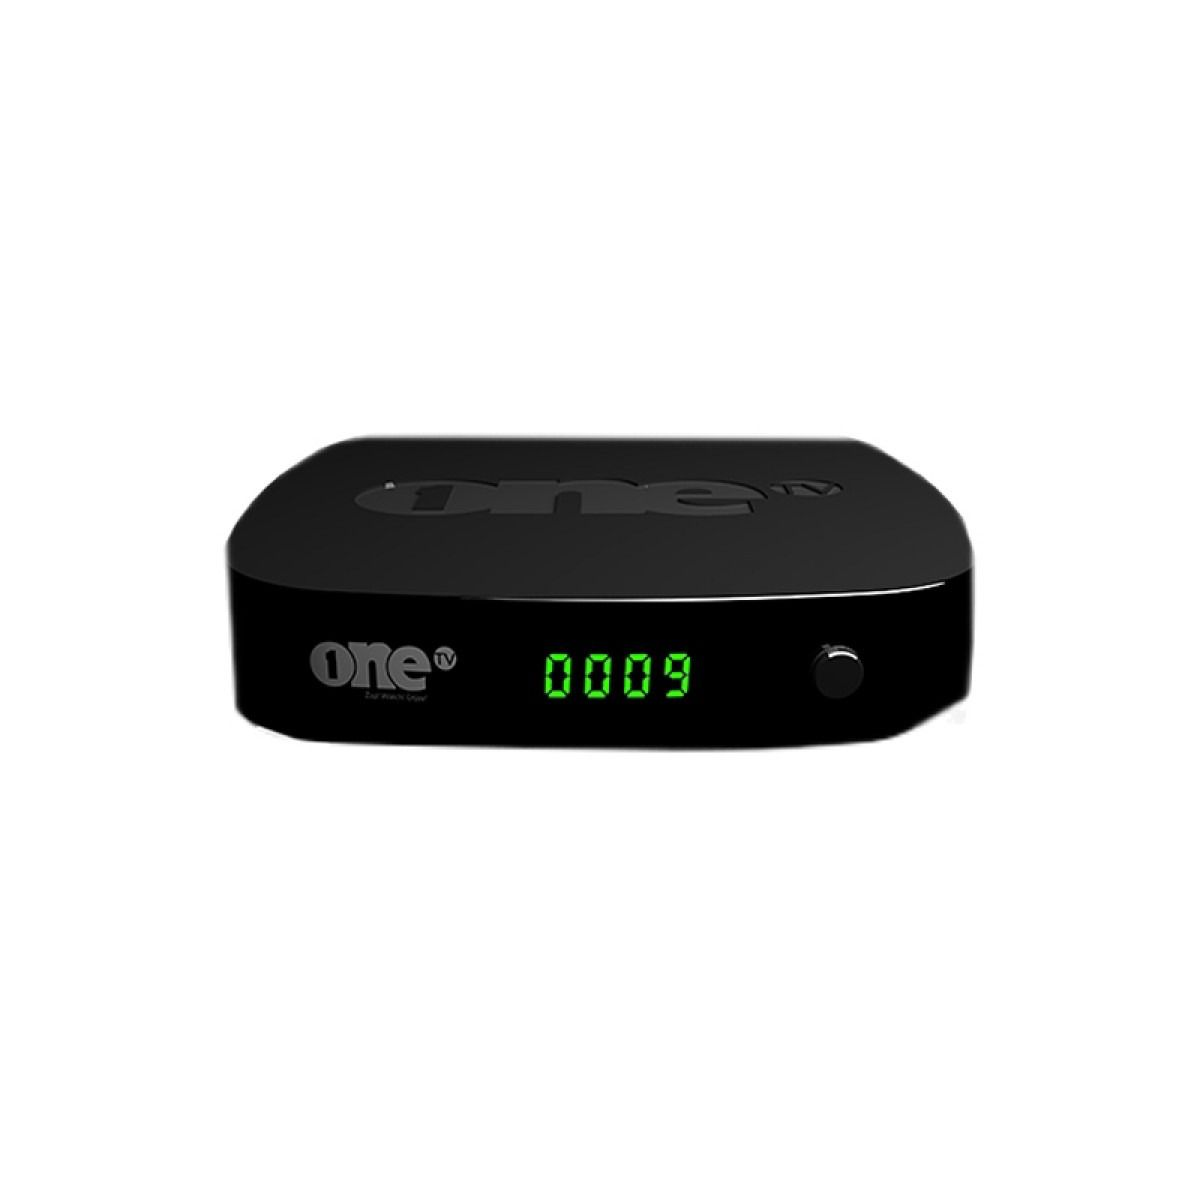 Receptor OneTv Ultra HD 4K Com IPTV/WIFI HDMI